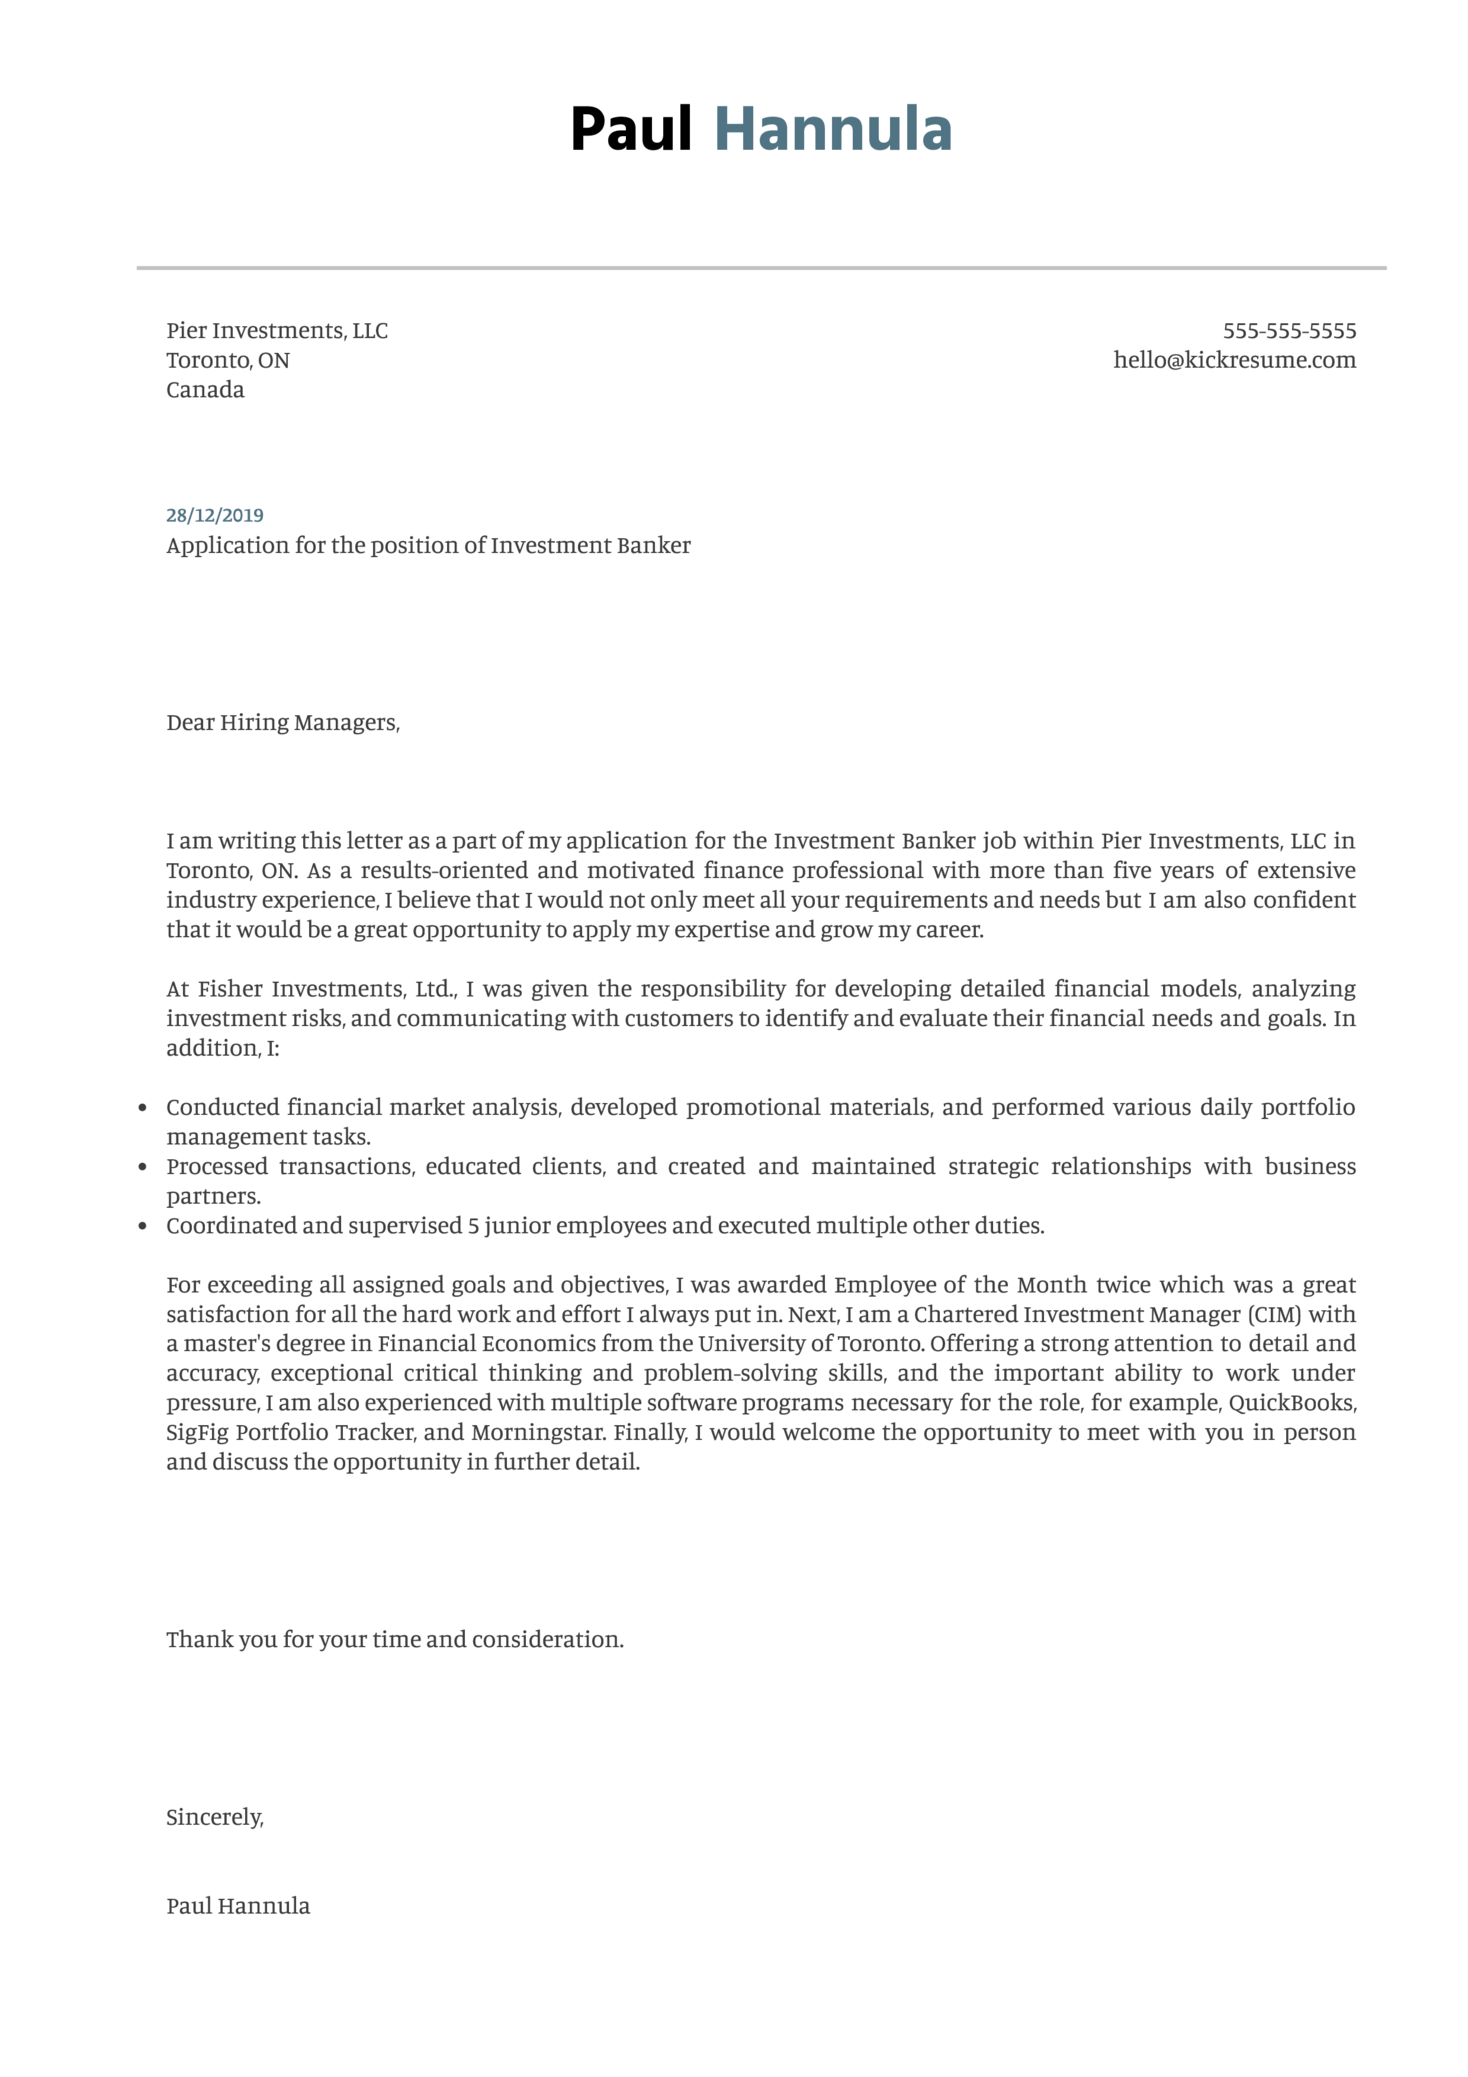 Investment Banker Cover Letter Sample